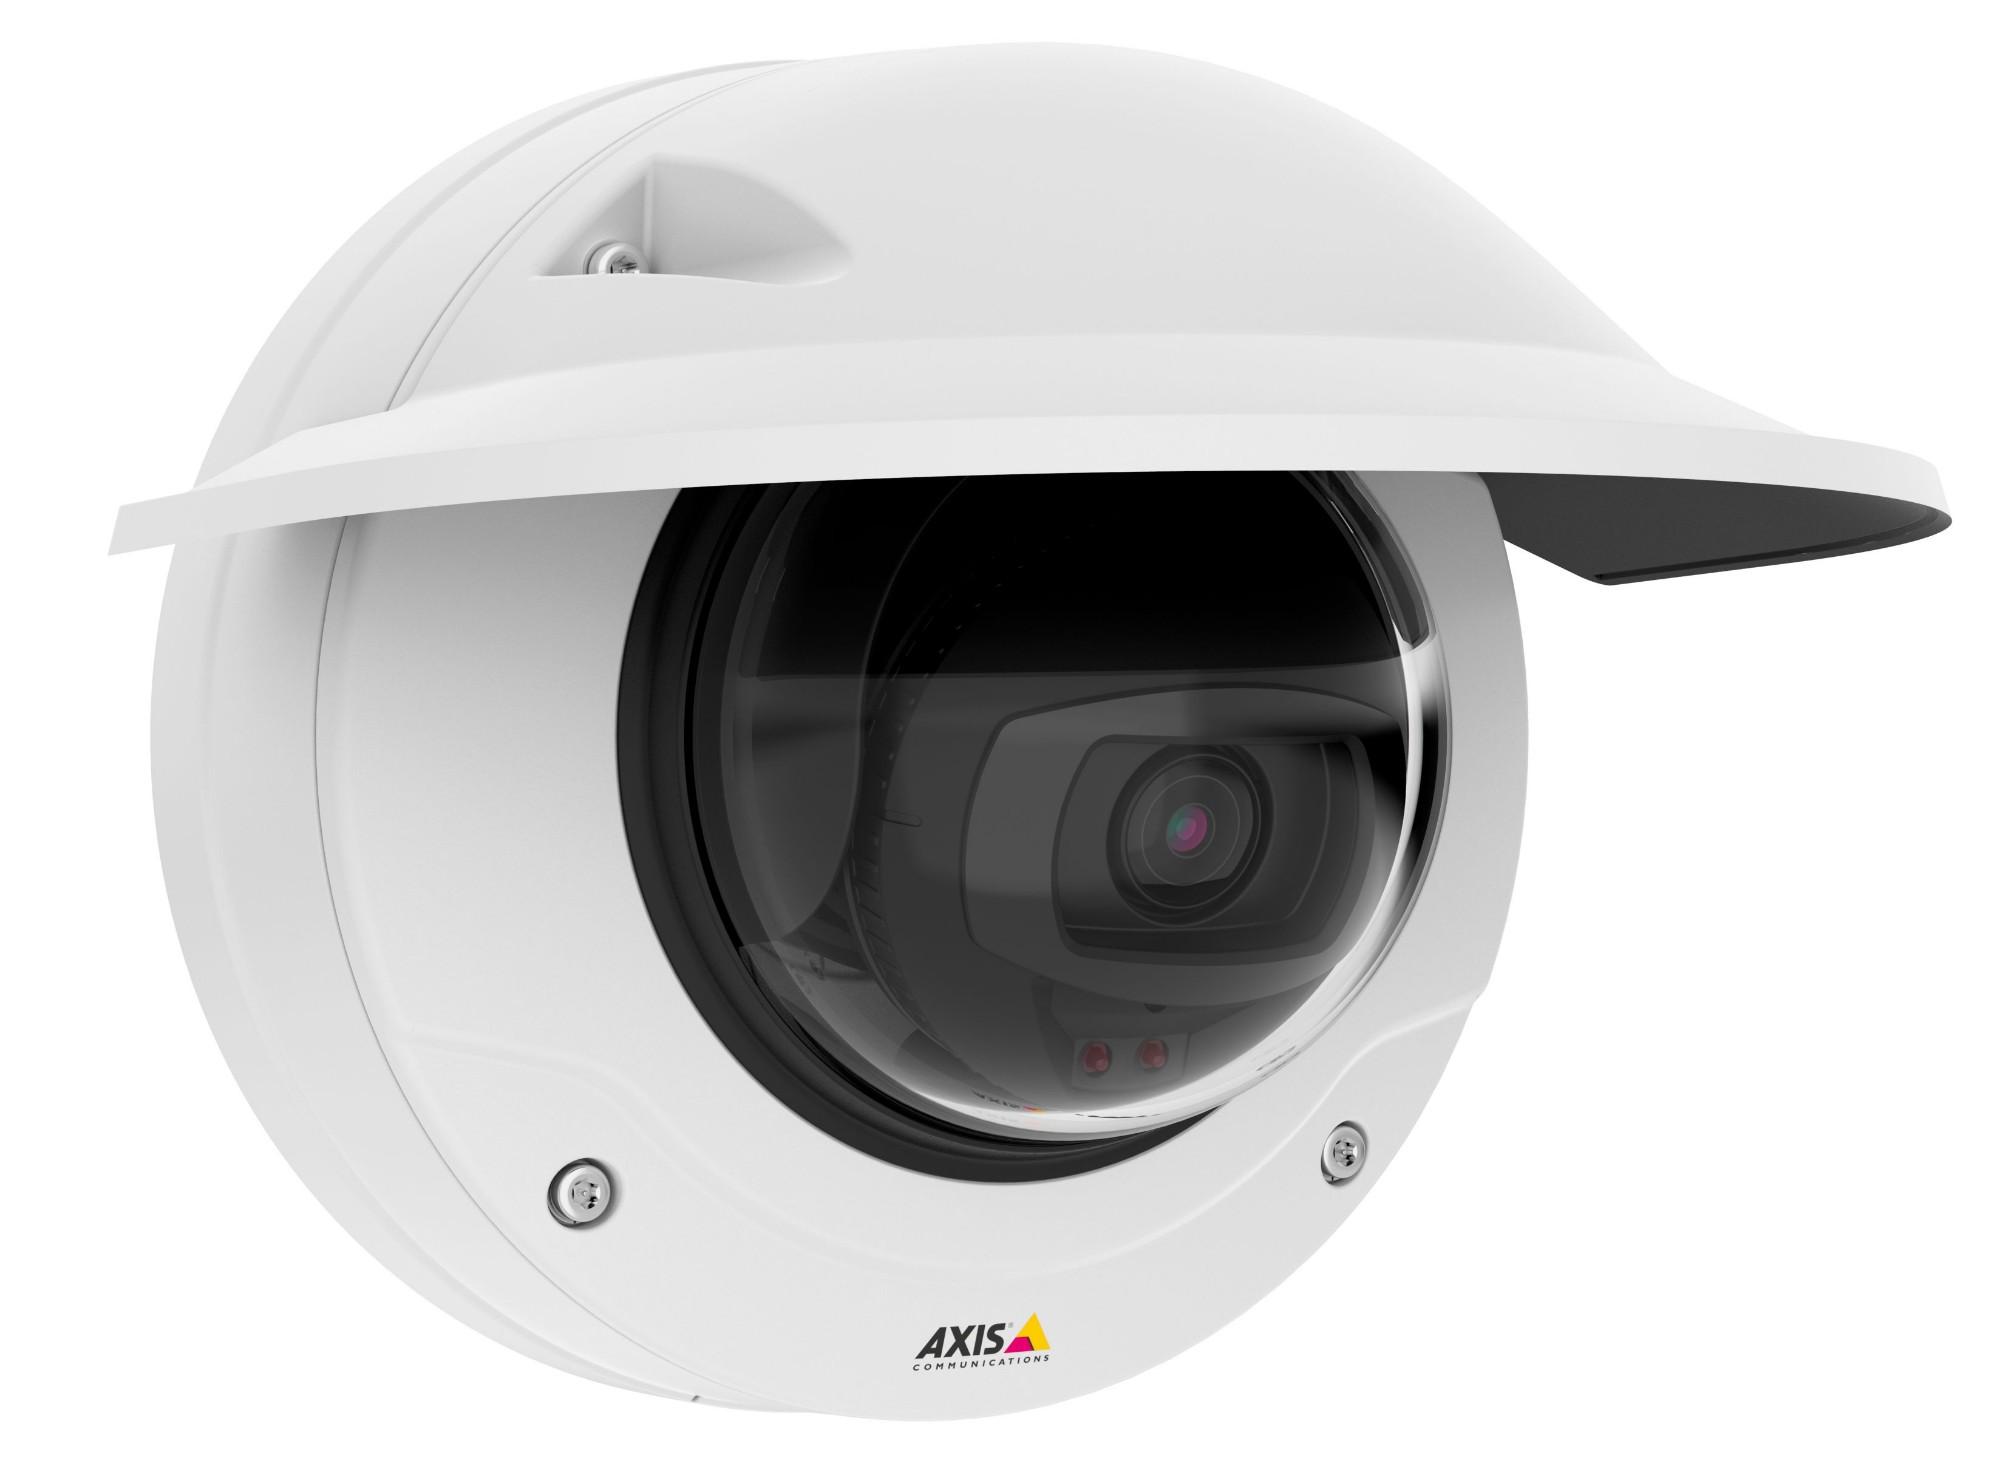 Axis Q3515-LVE Cámara de seguridad IP Exterior Almohadilla Techo 1920 x 1080 Pixeles